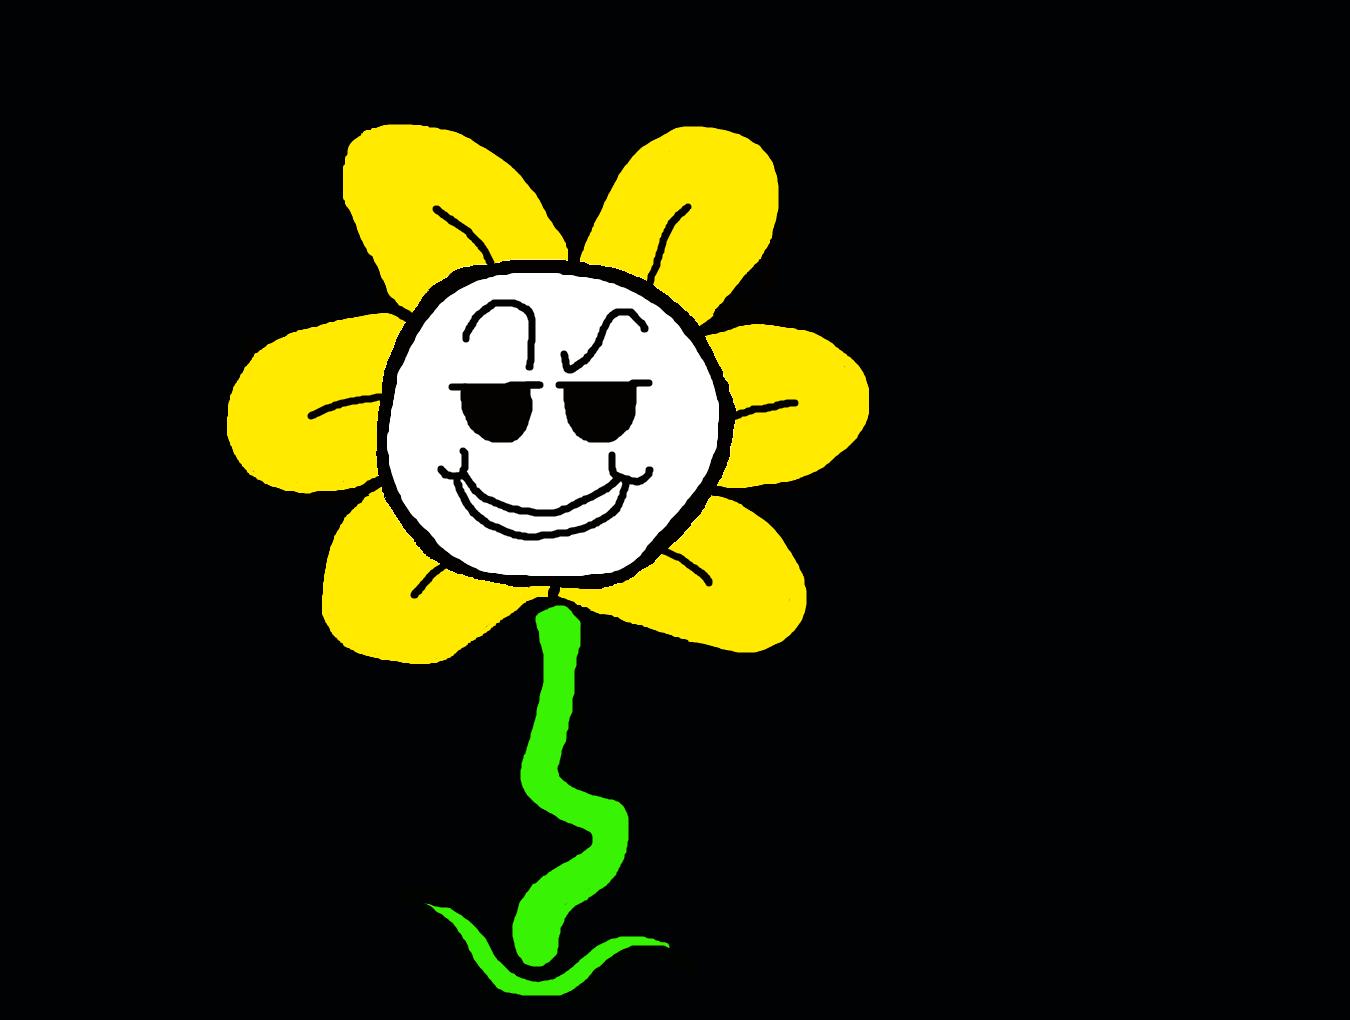 Flowey the Flower by TheDarkBrawler90 on DeviantArt